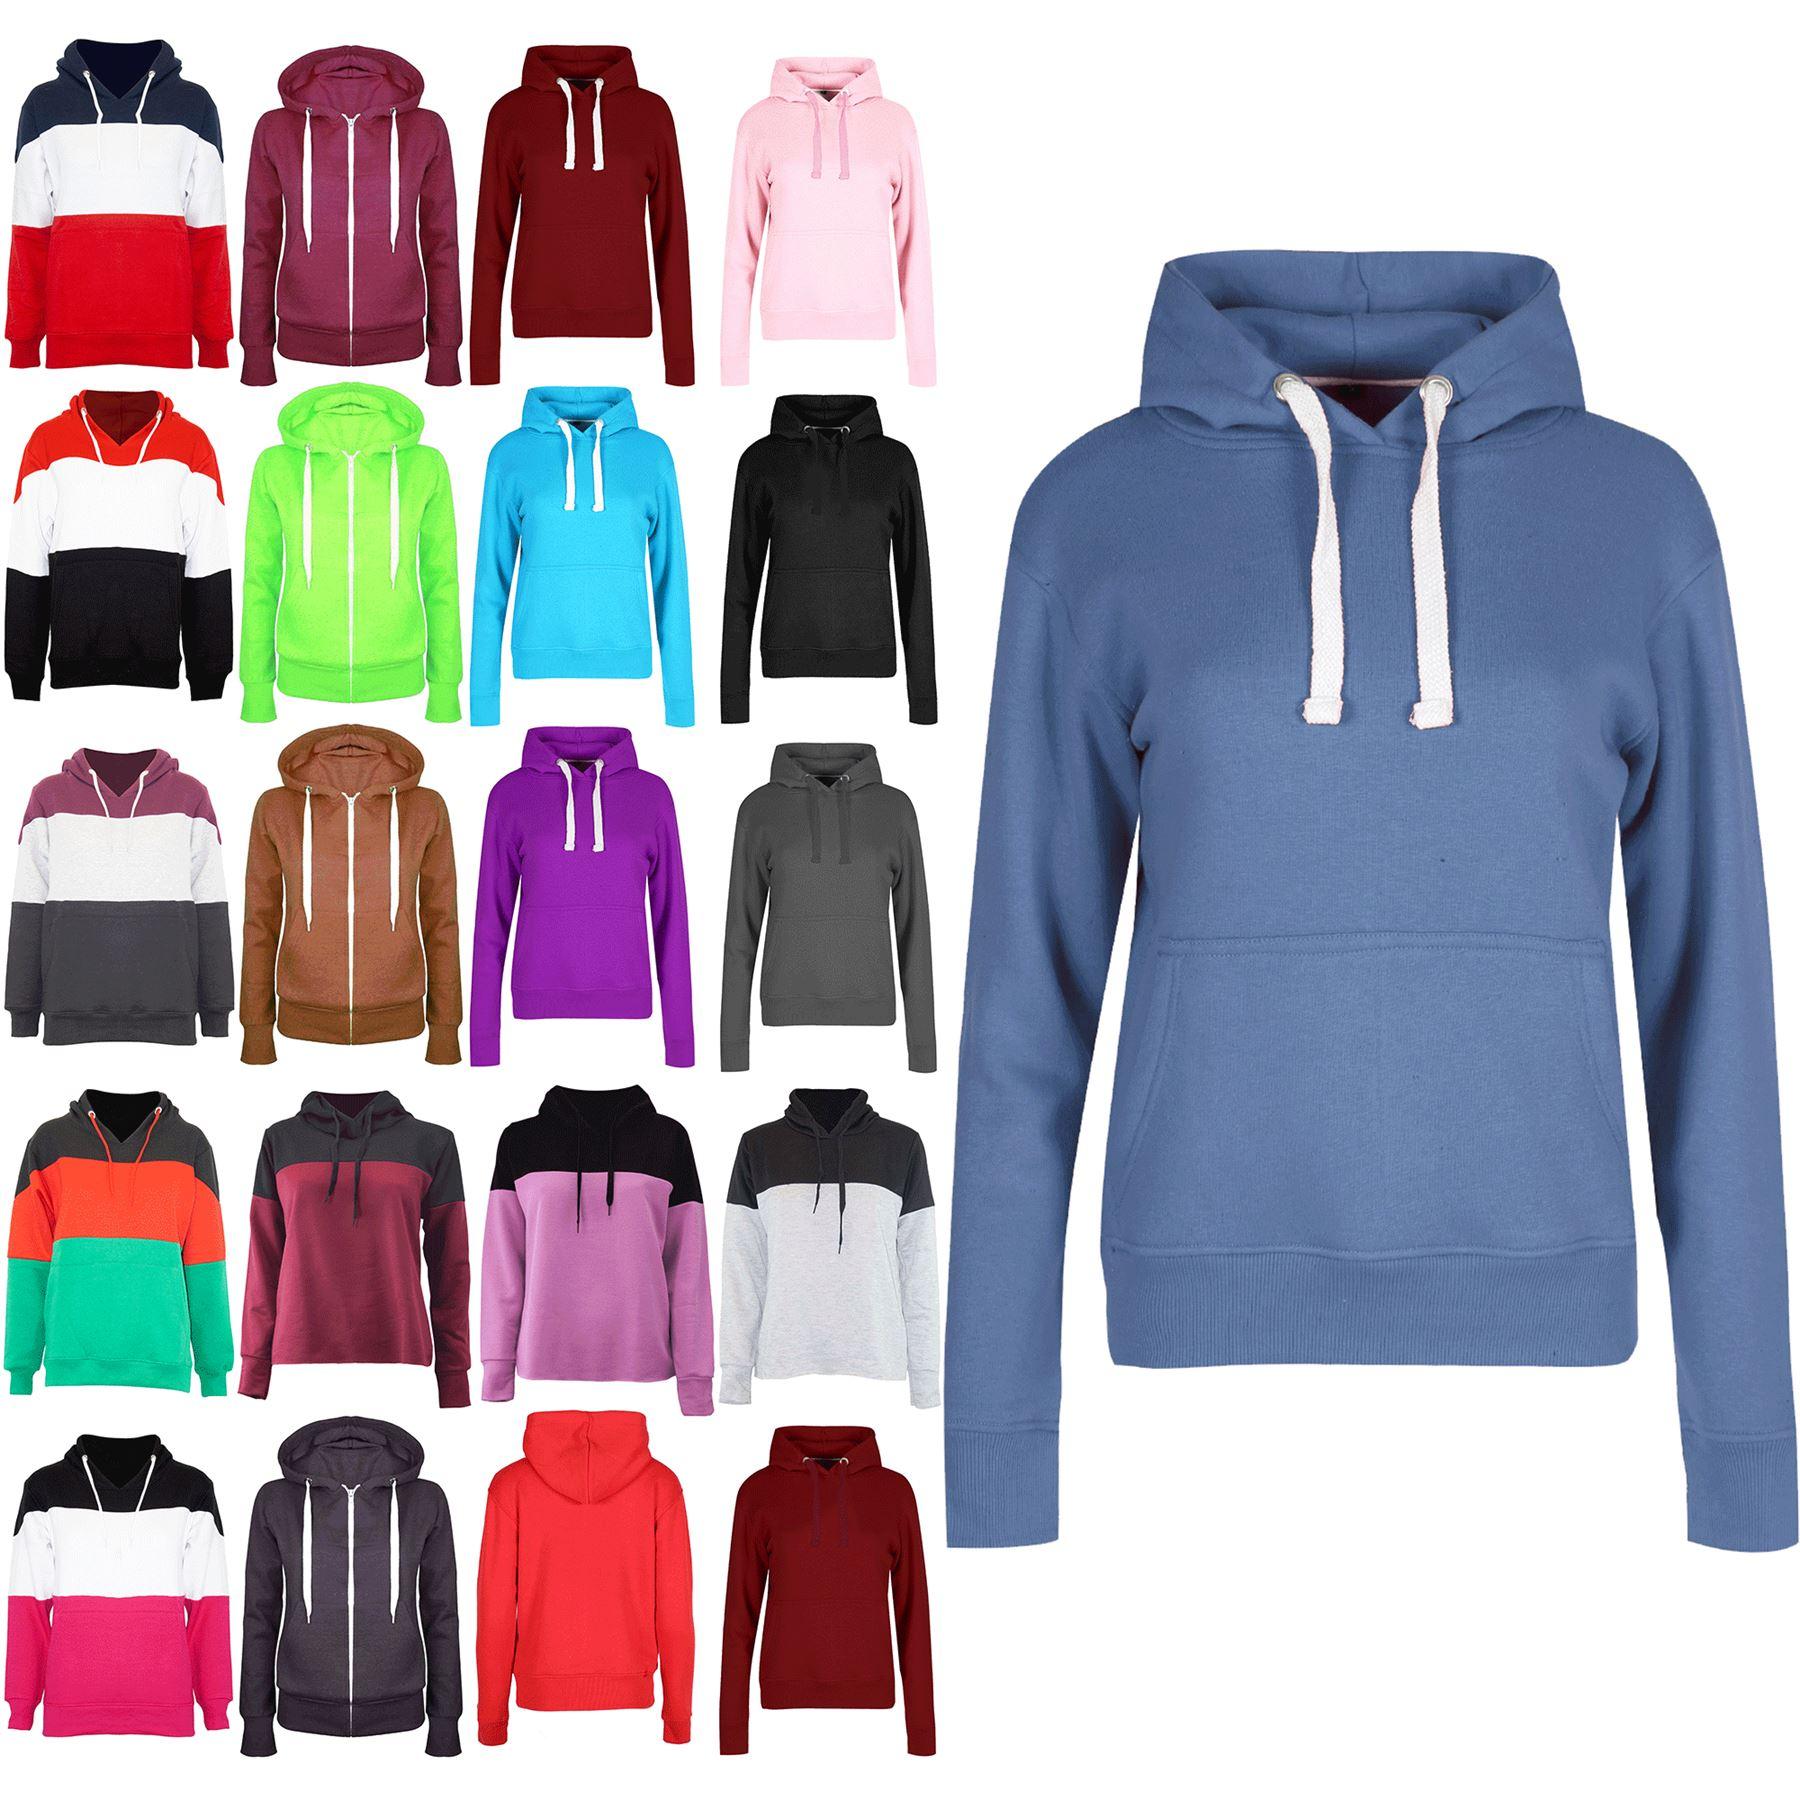 Original Womens Hoodies Ladies Long Sleeve Fleece Knit Side Pockets Jumper Top Sweatshirt Weder Zu Hart Noch Zu Weich